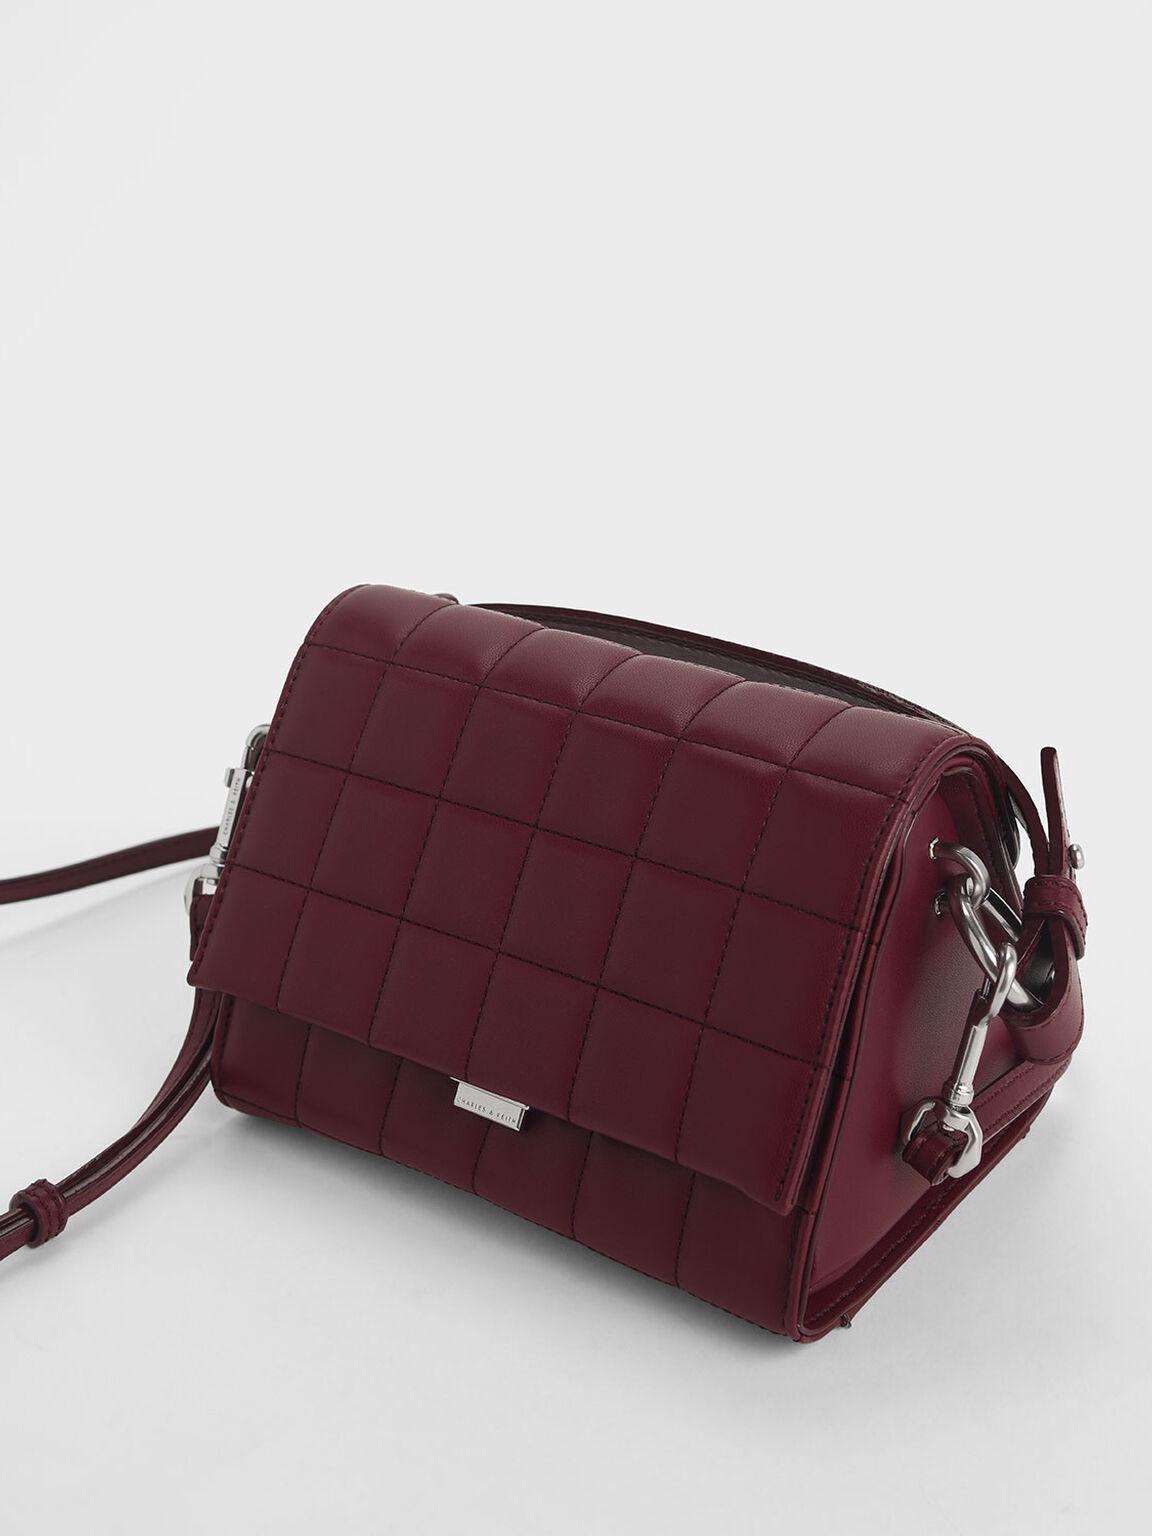 Quilted Push Lock Handbag, Burgundy, hi-res